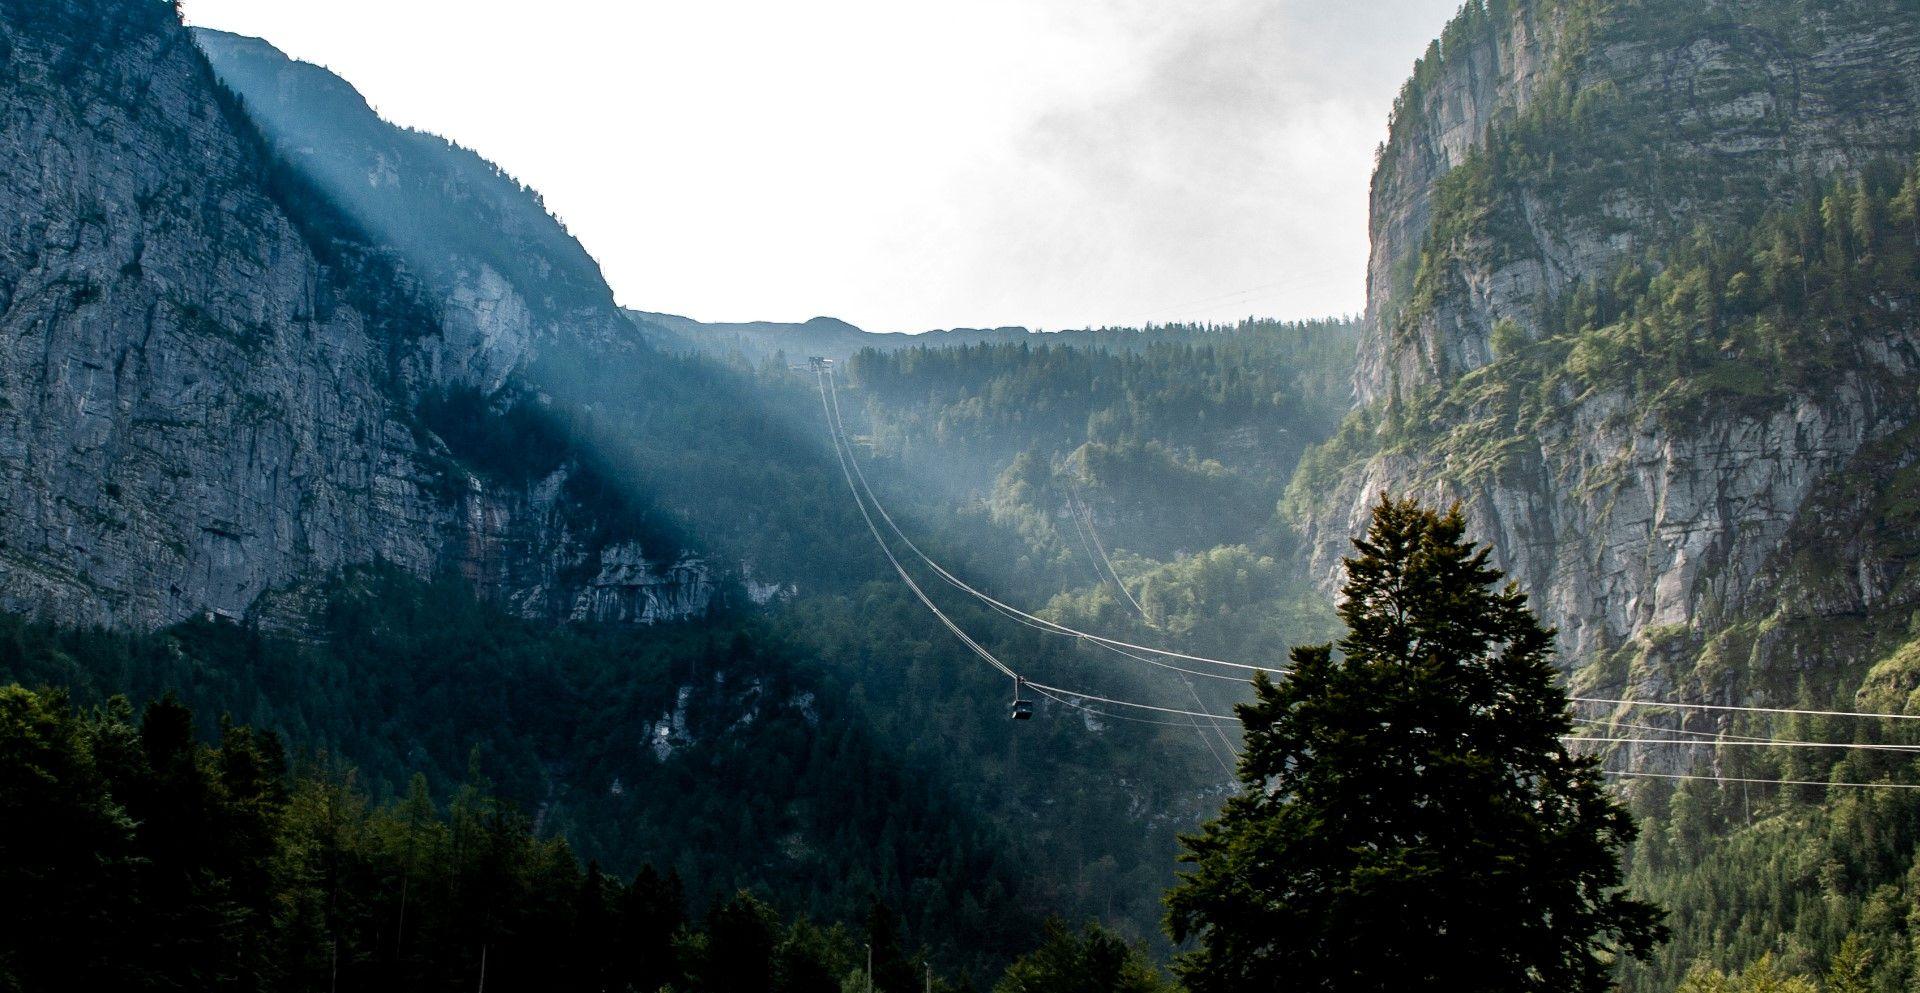 Hallstat, Austria vidikovac 5 prstiju gondola